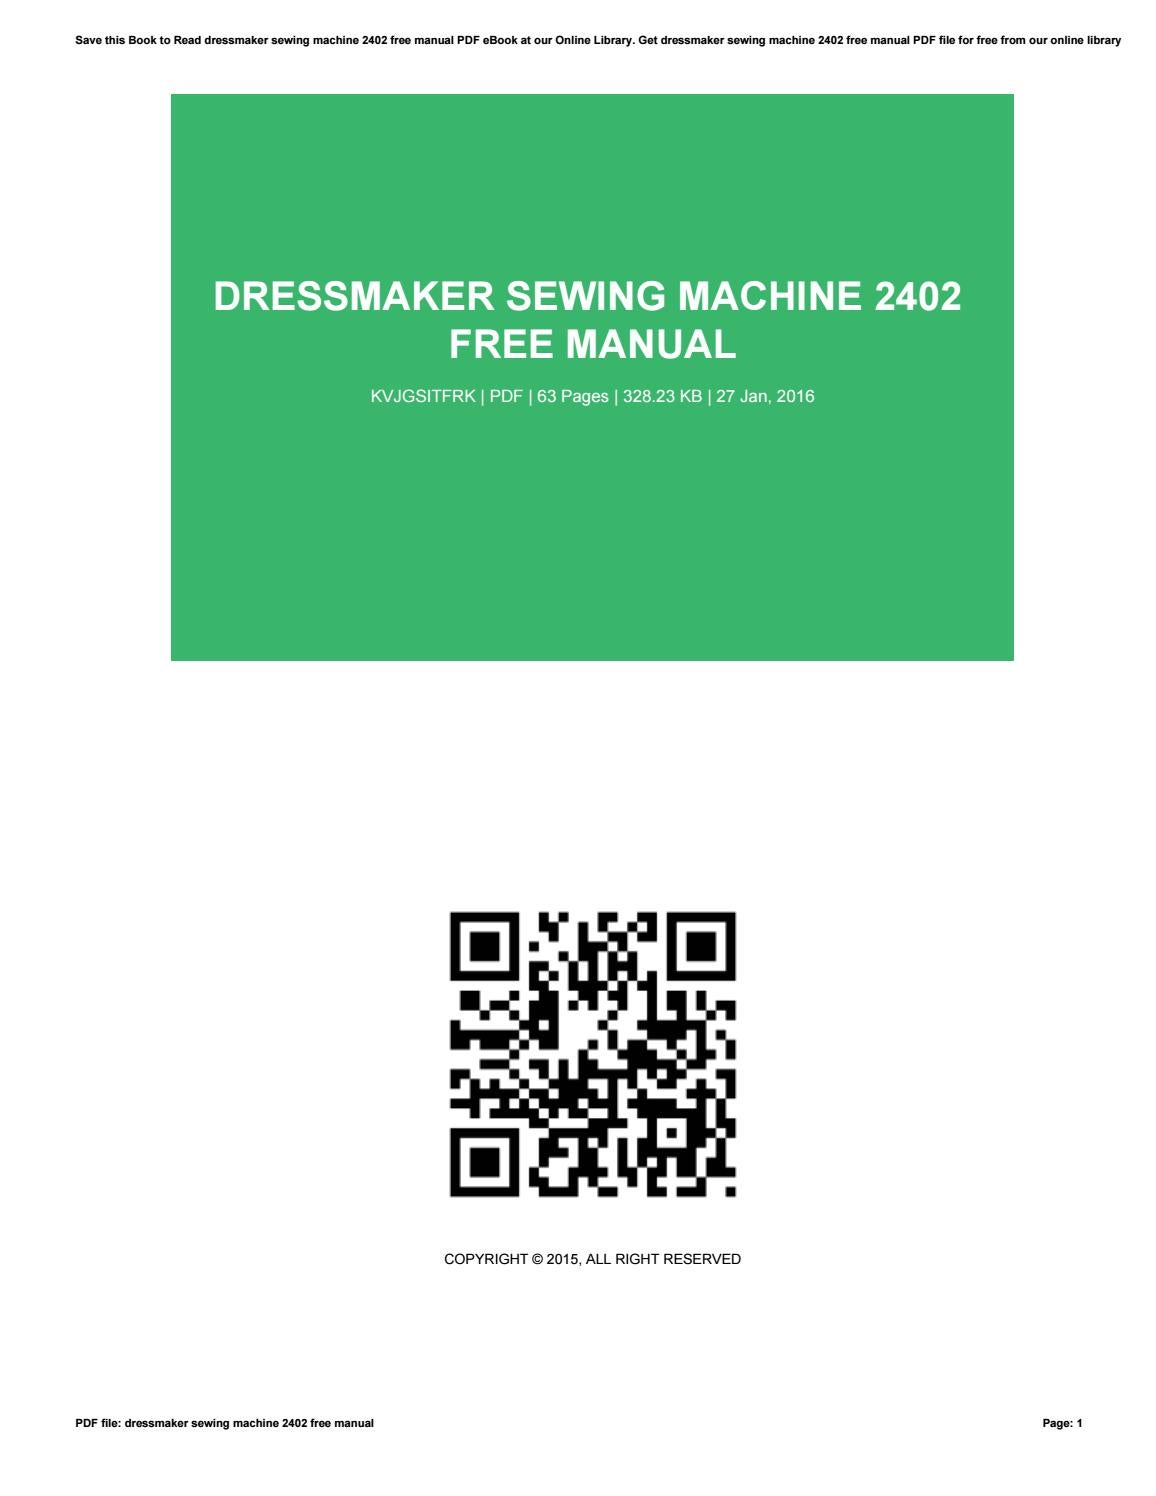 free dressmaker sewing machine manual